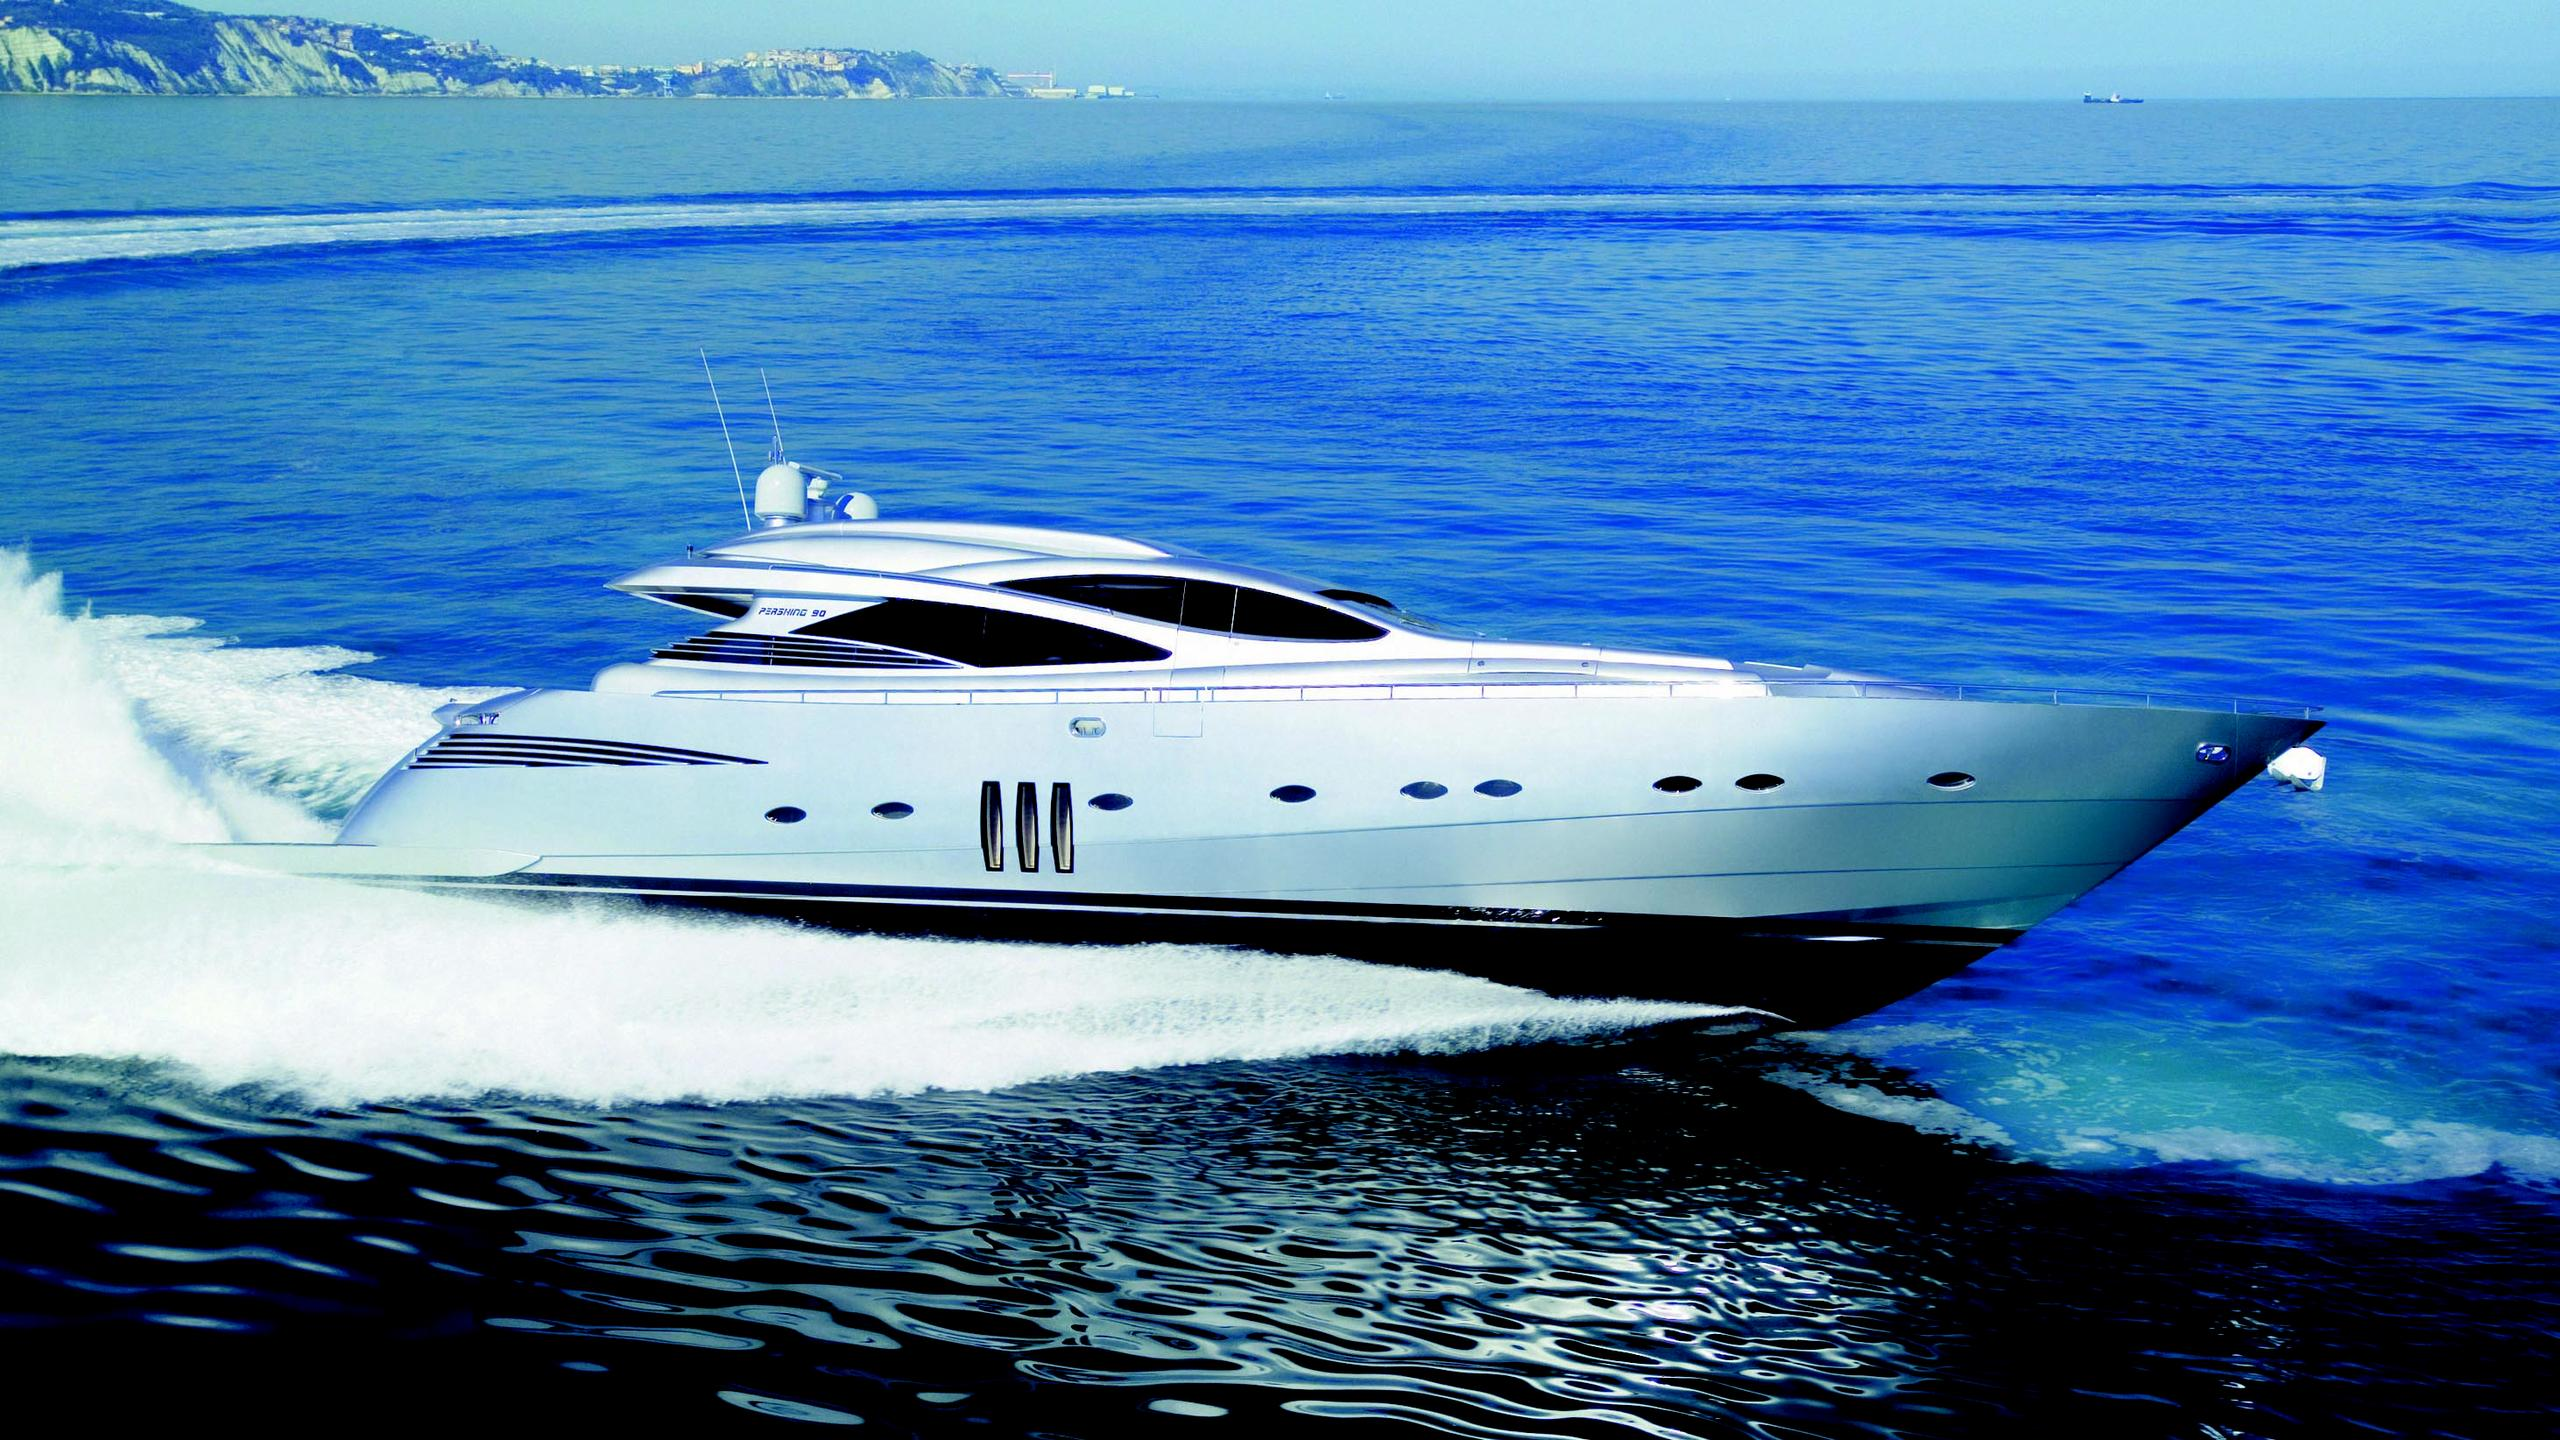 tania-2-motor-yacht-pershing-90-2007-27m-cruising